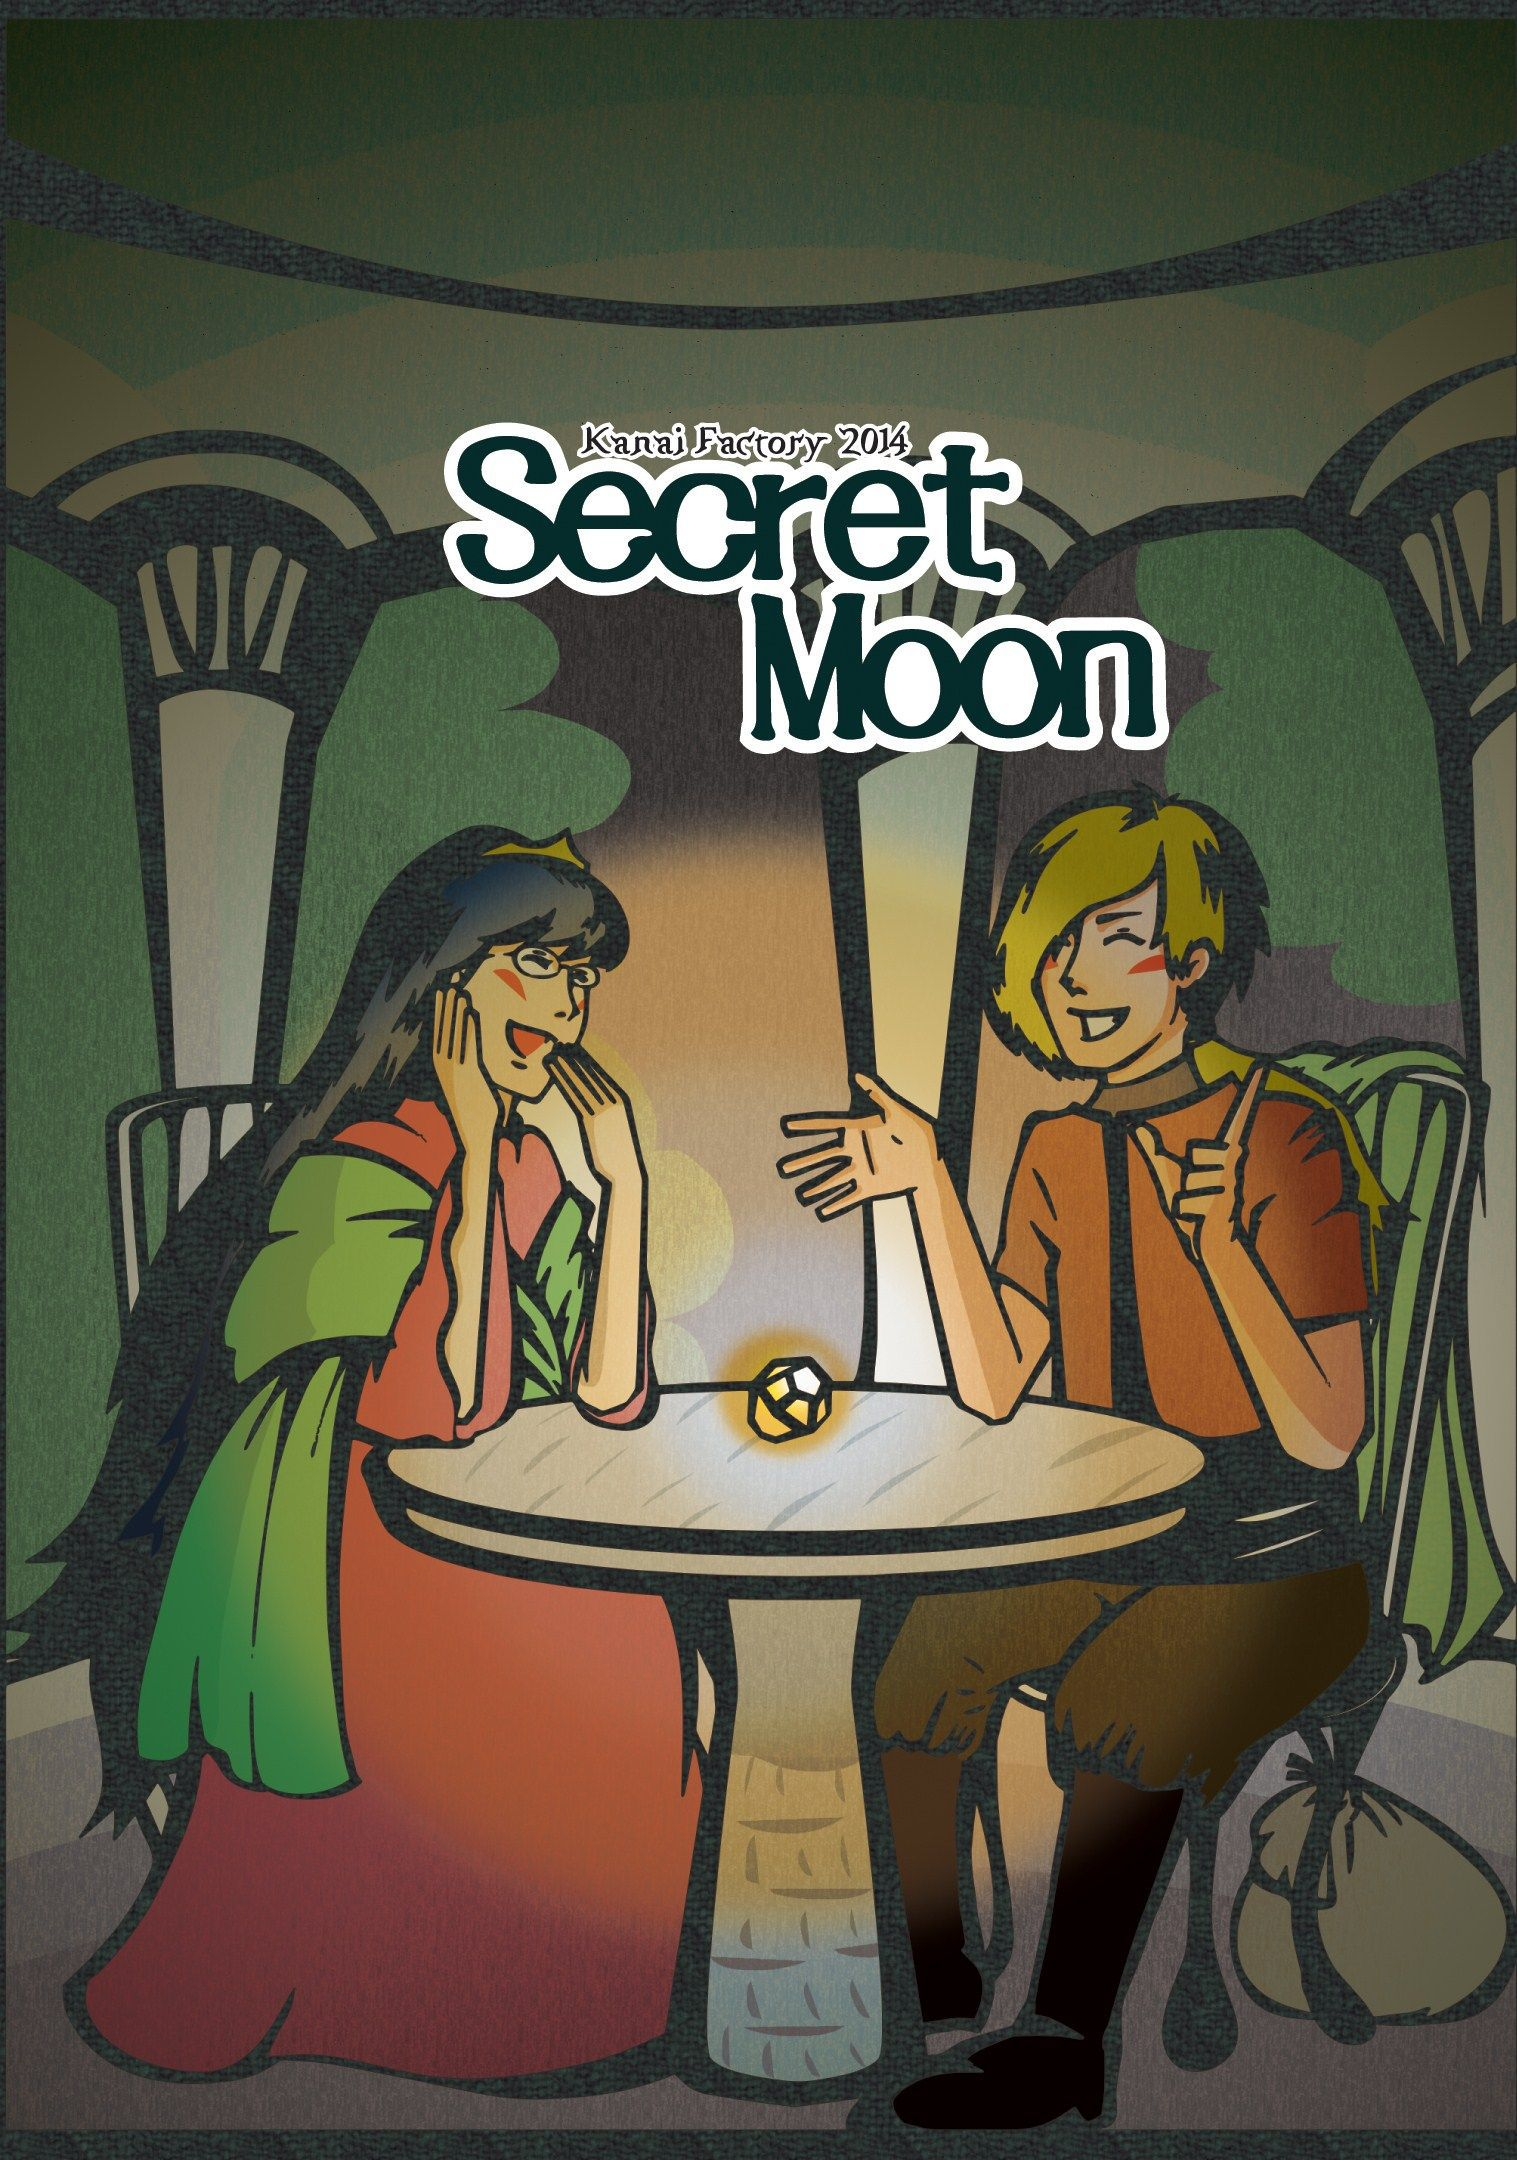 Secret Moon